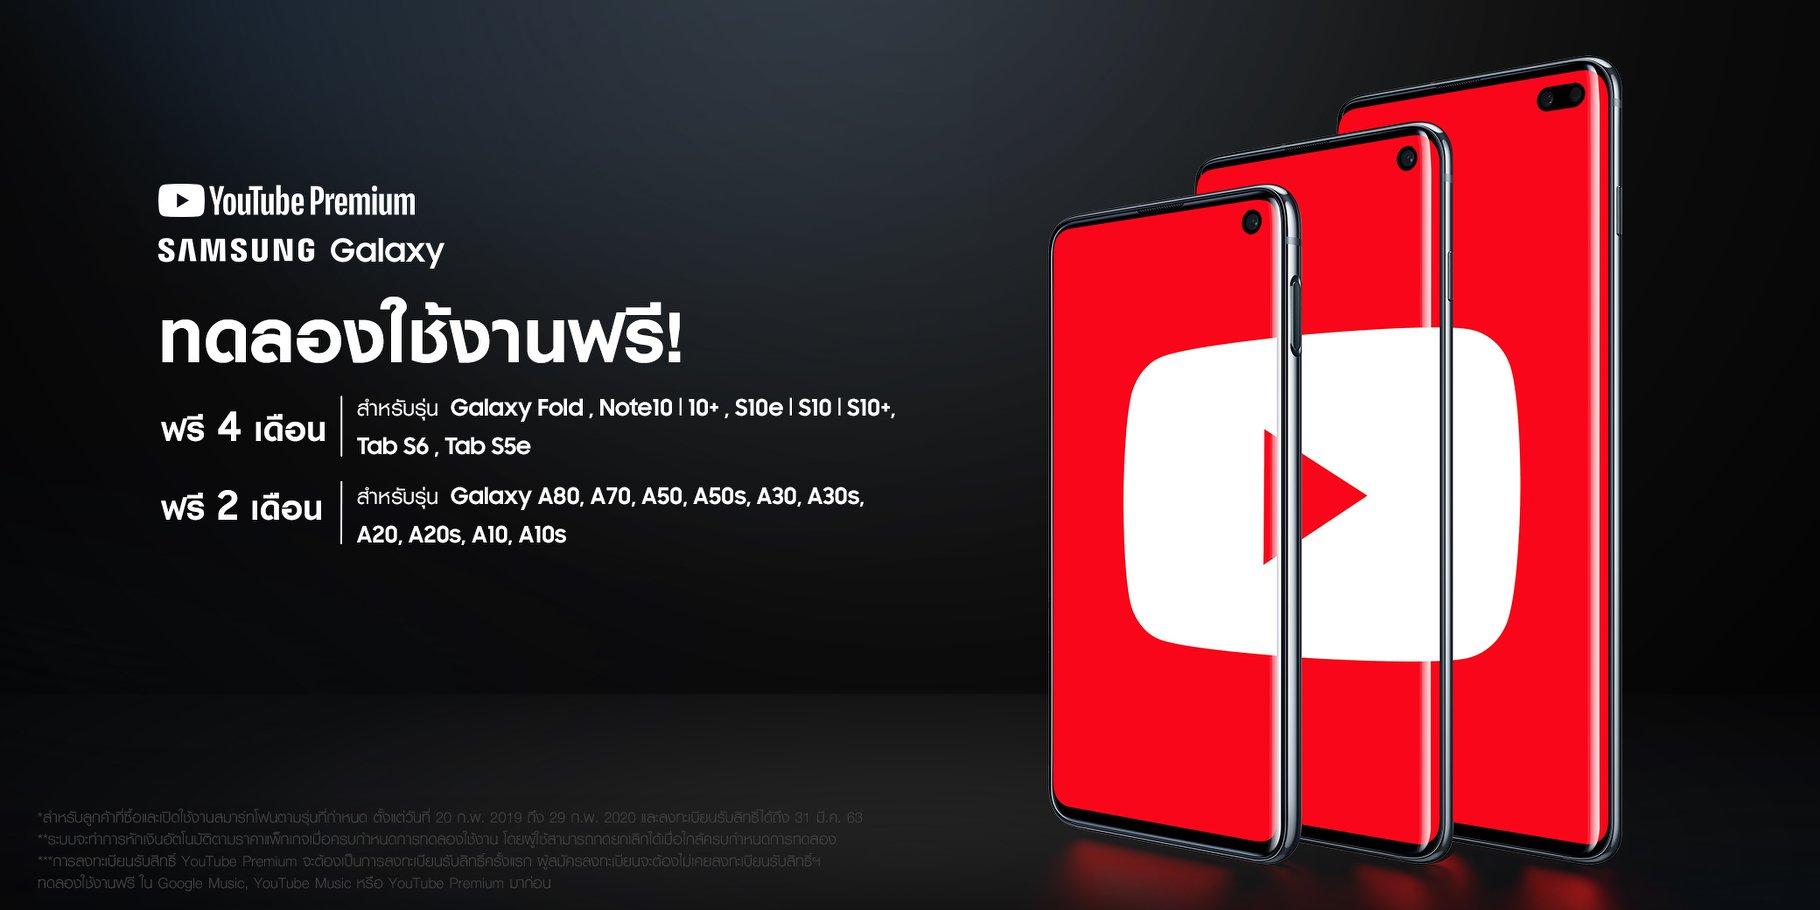 Samsung Galaxy x YouTube Premium